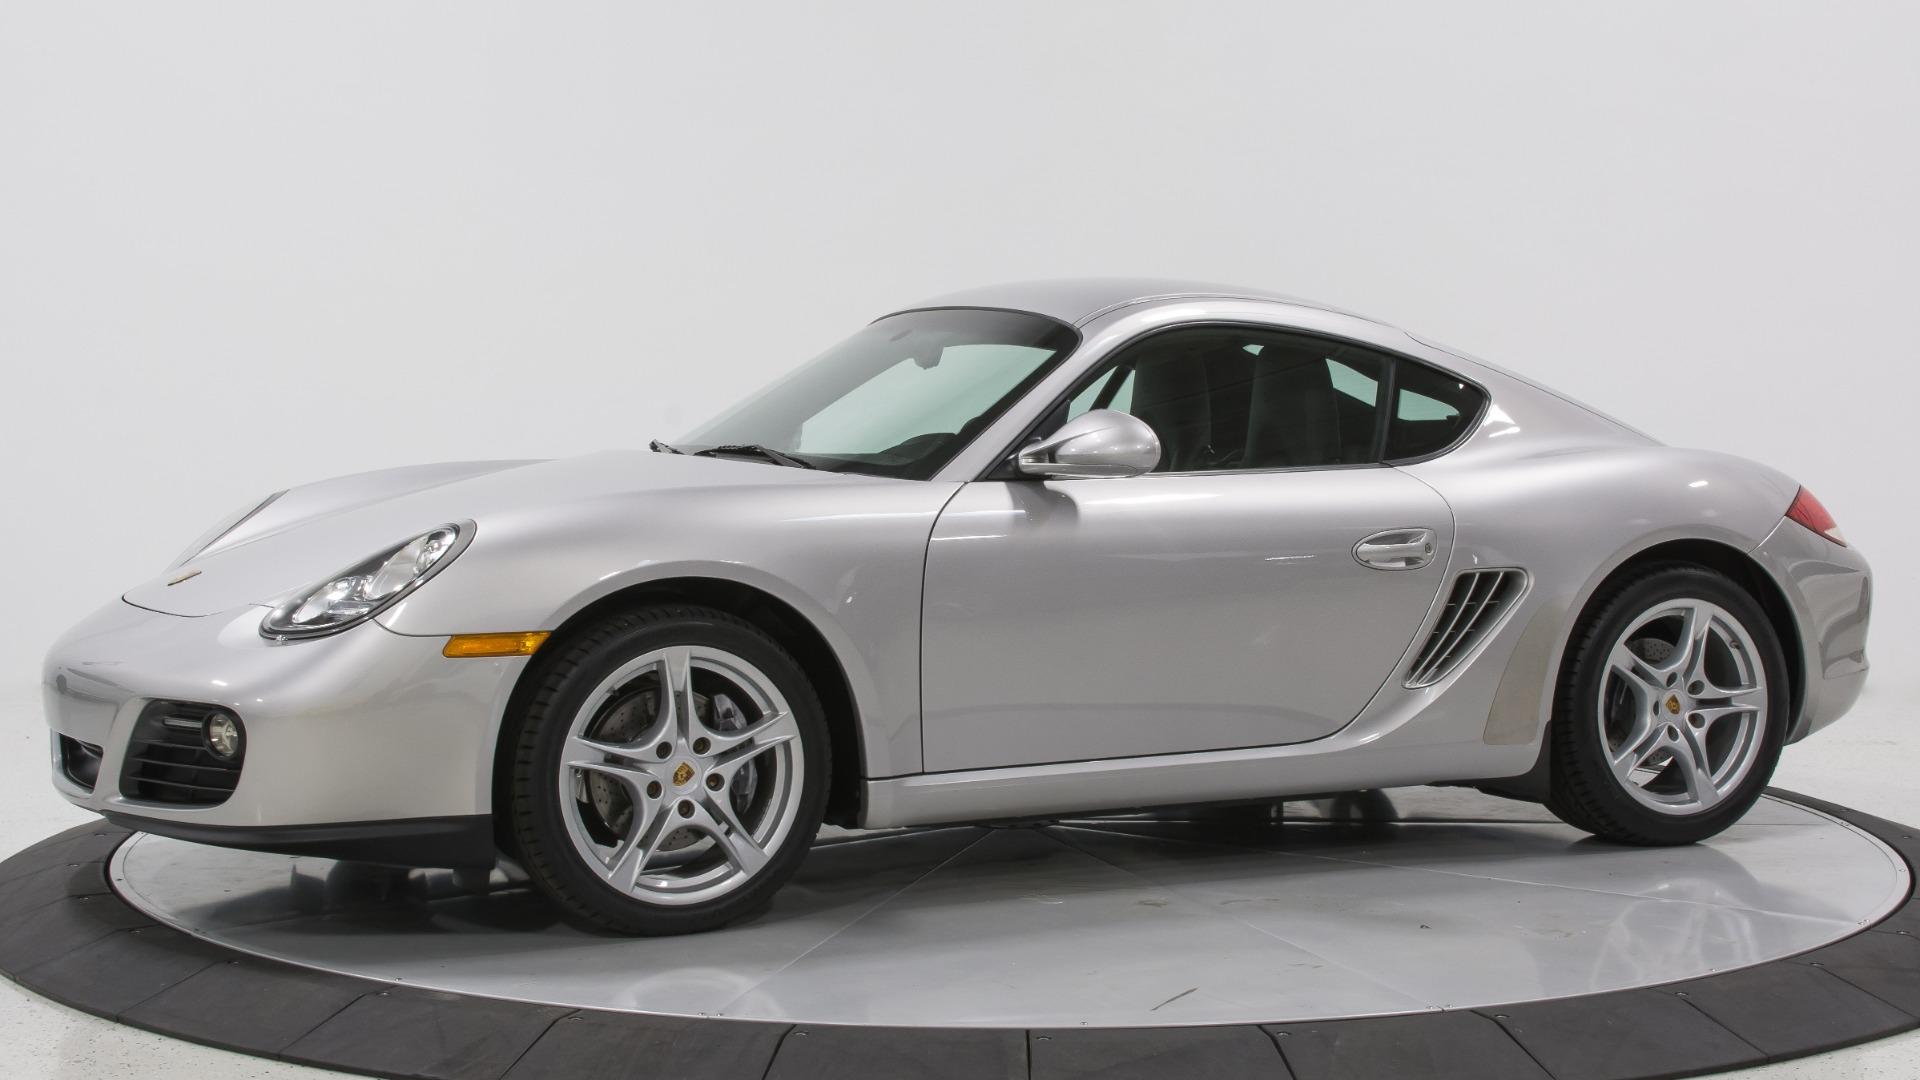 2011 Porsche Cayman Stock # 22561 for sale near Pompano Beach, FL ...